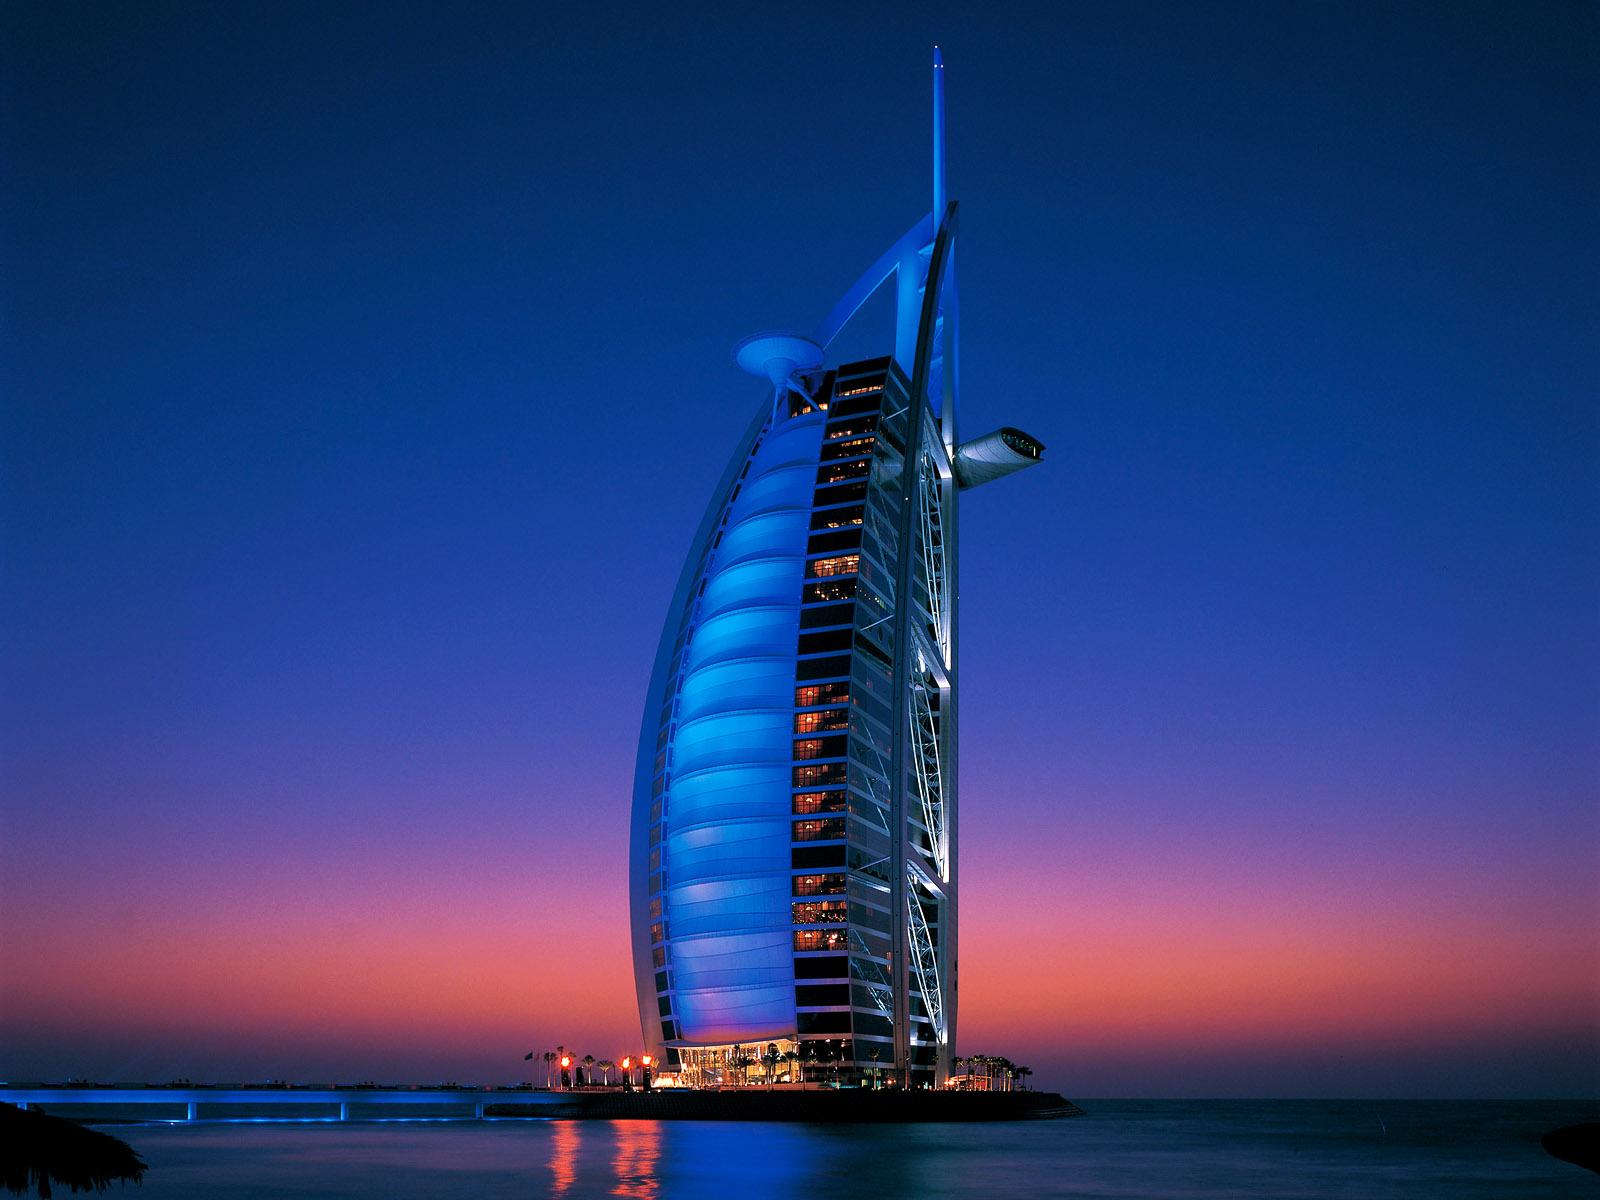 Ash 39 s supercalifragilisticexpialidocious blog Burj al arab architecture